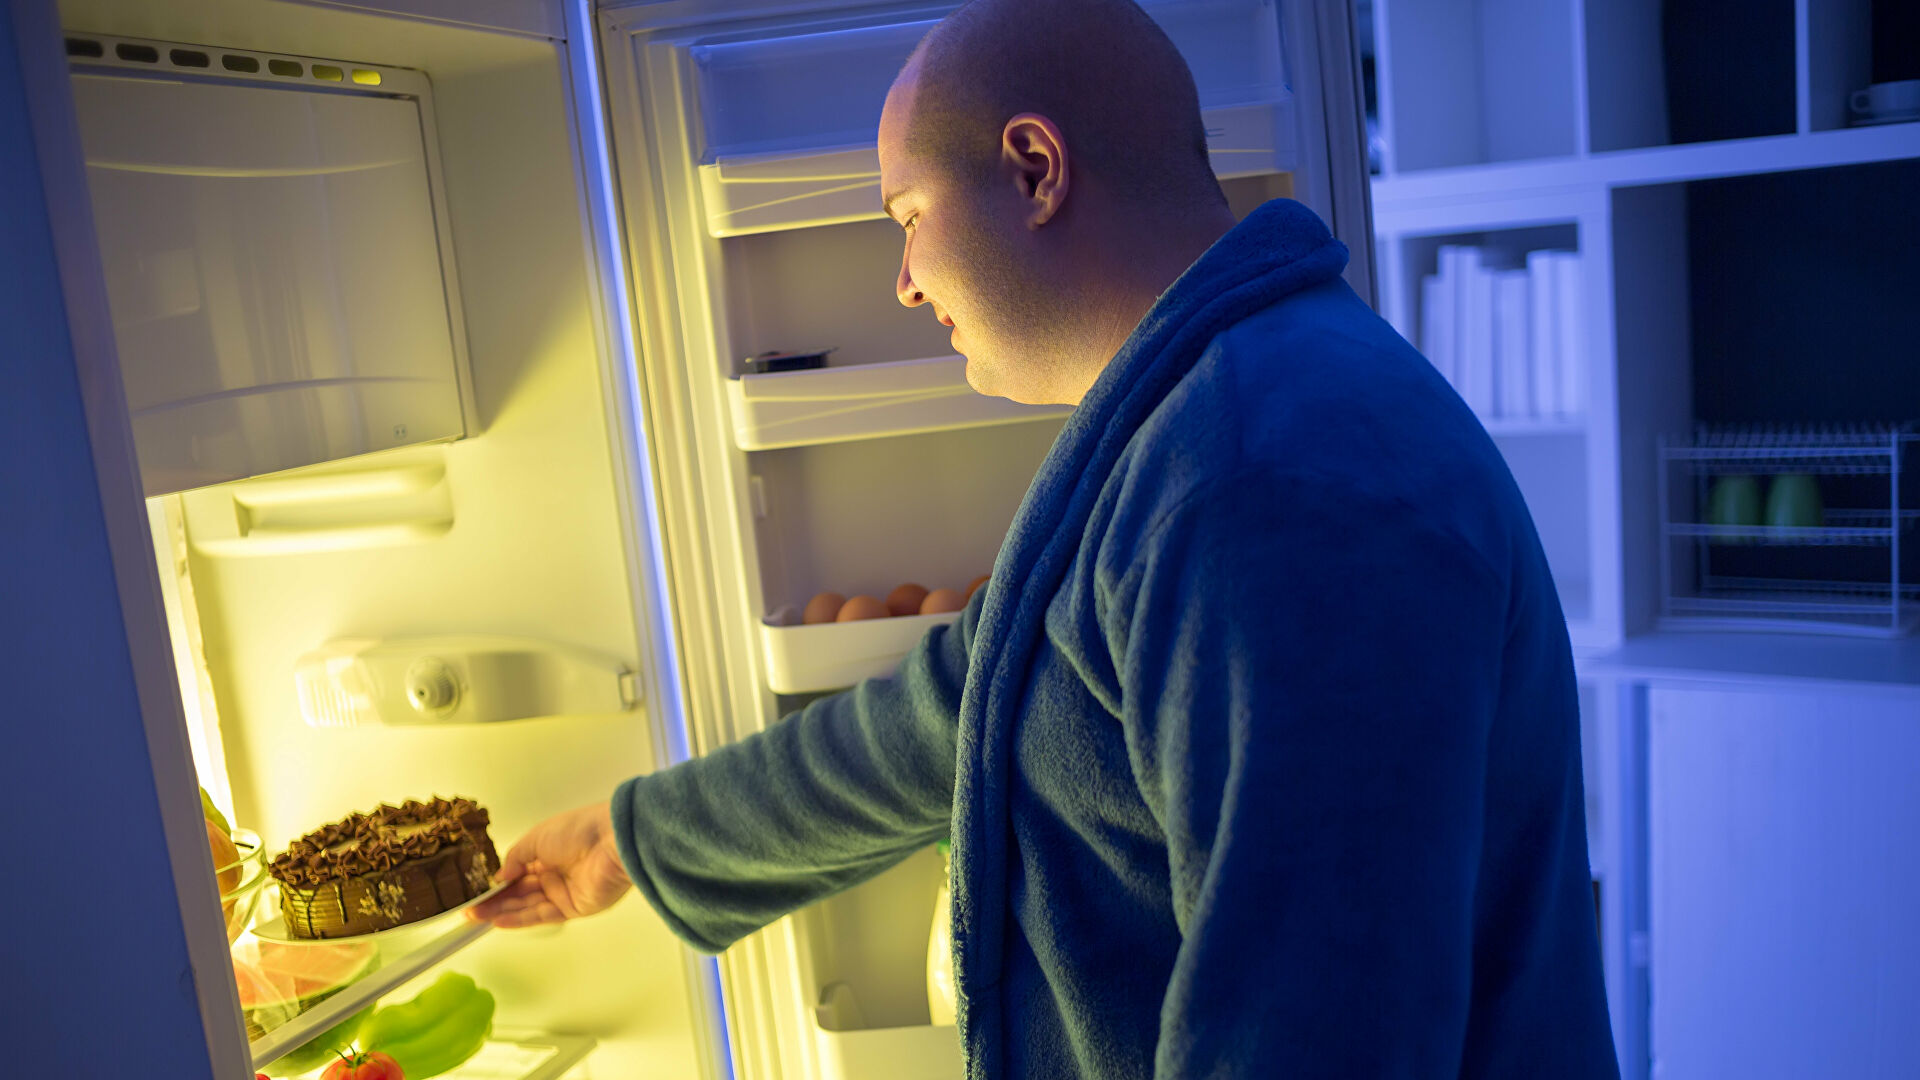 Толстый мужчина у холодильника - РИА Новости, 1920, 19.10.2020